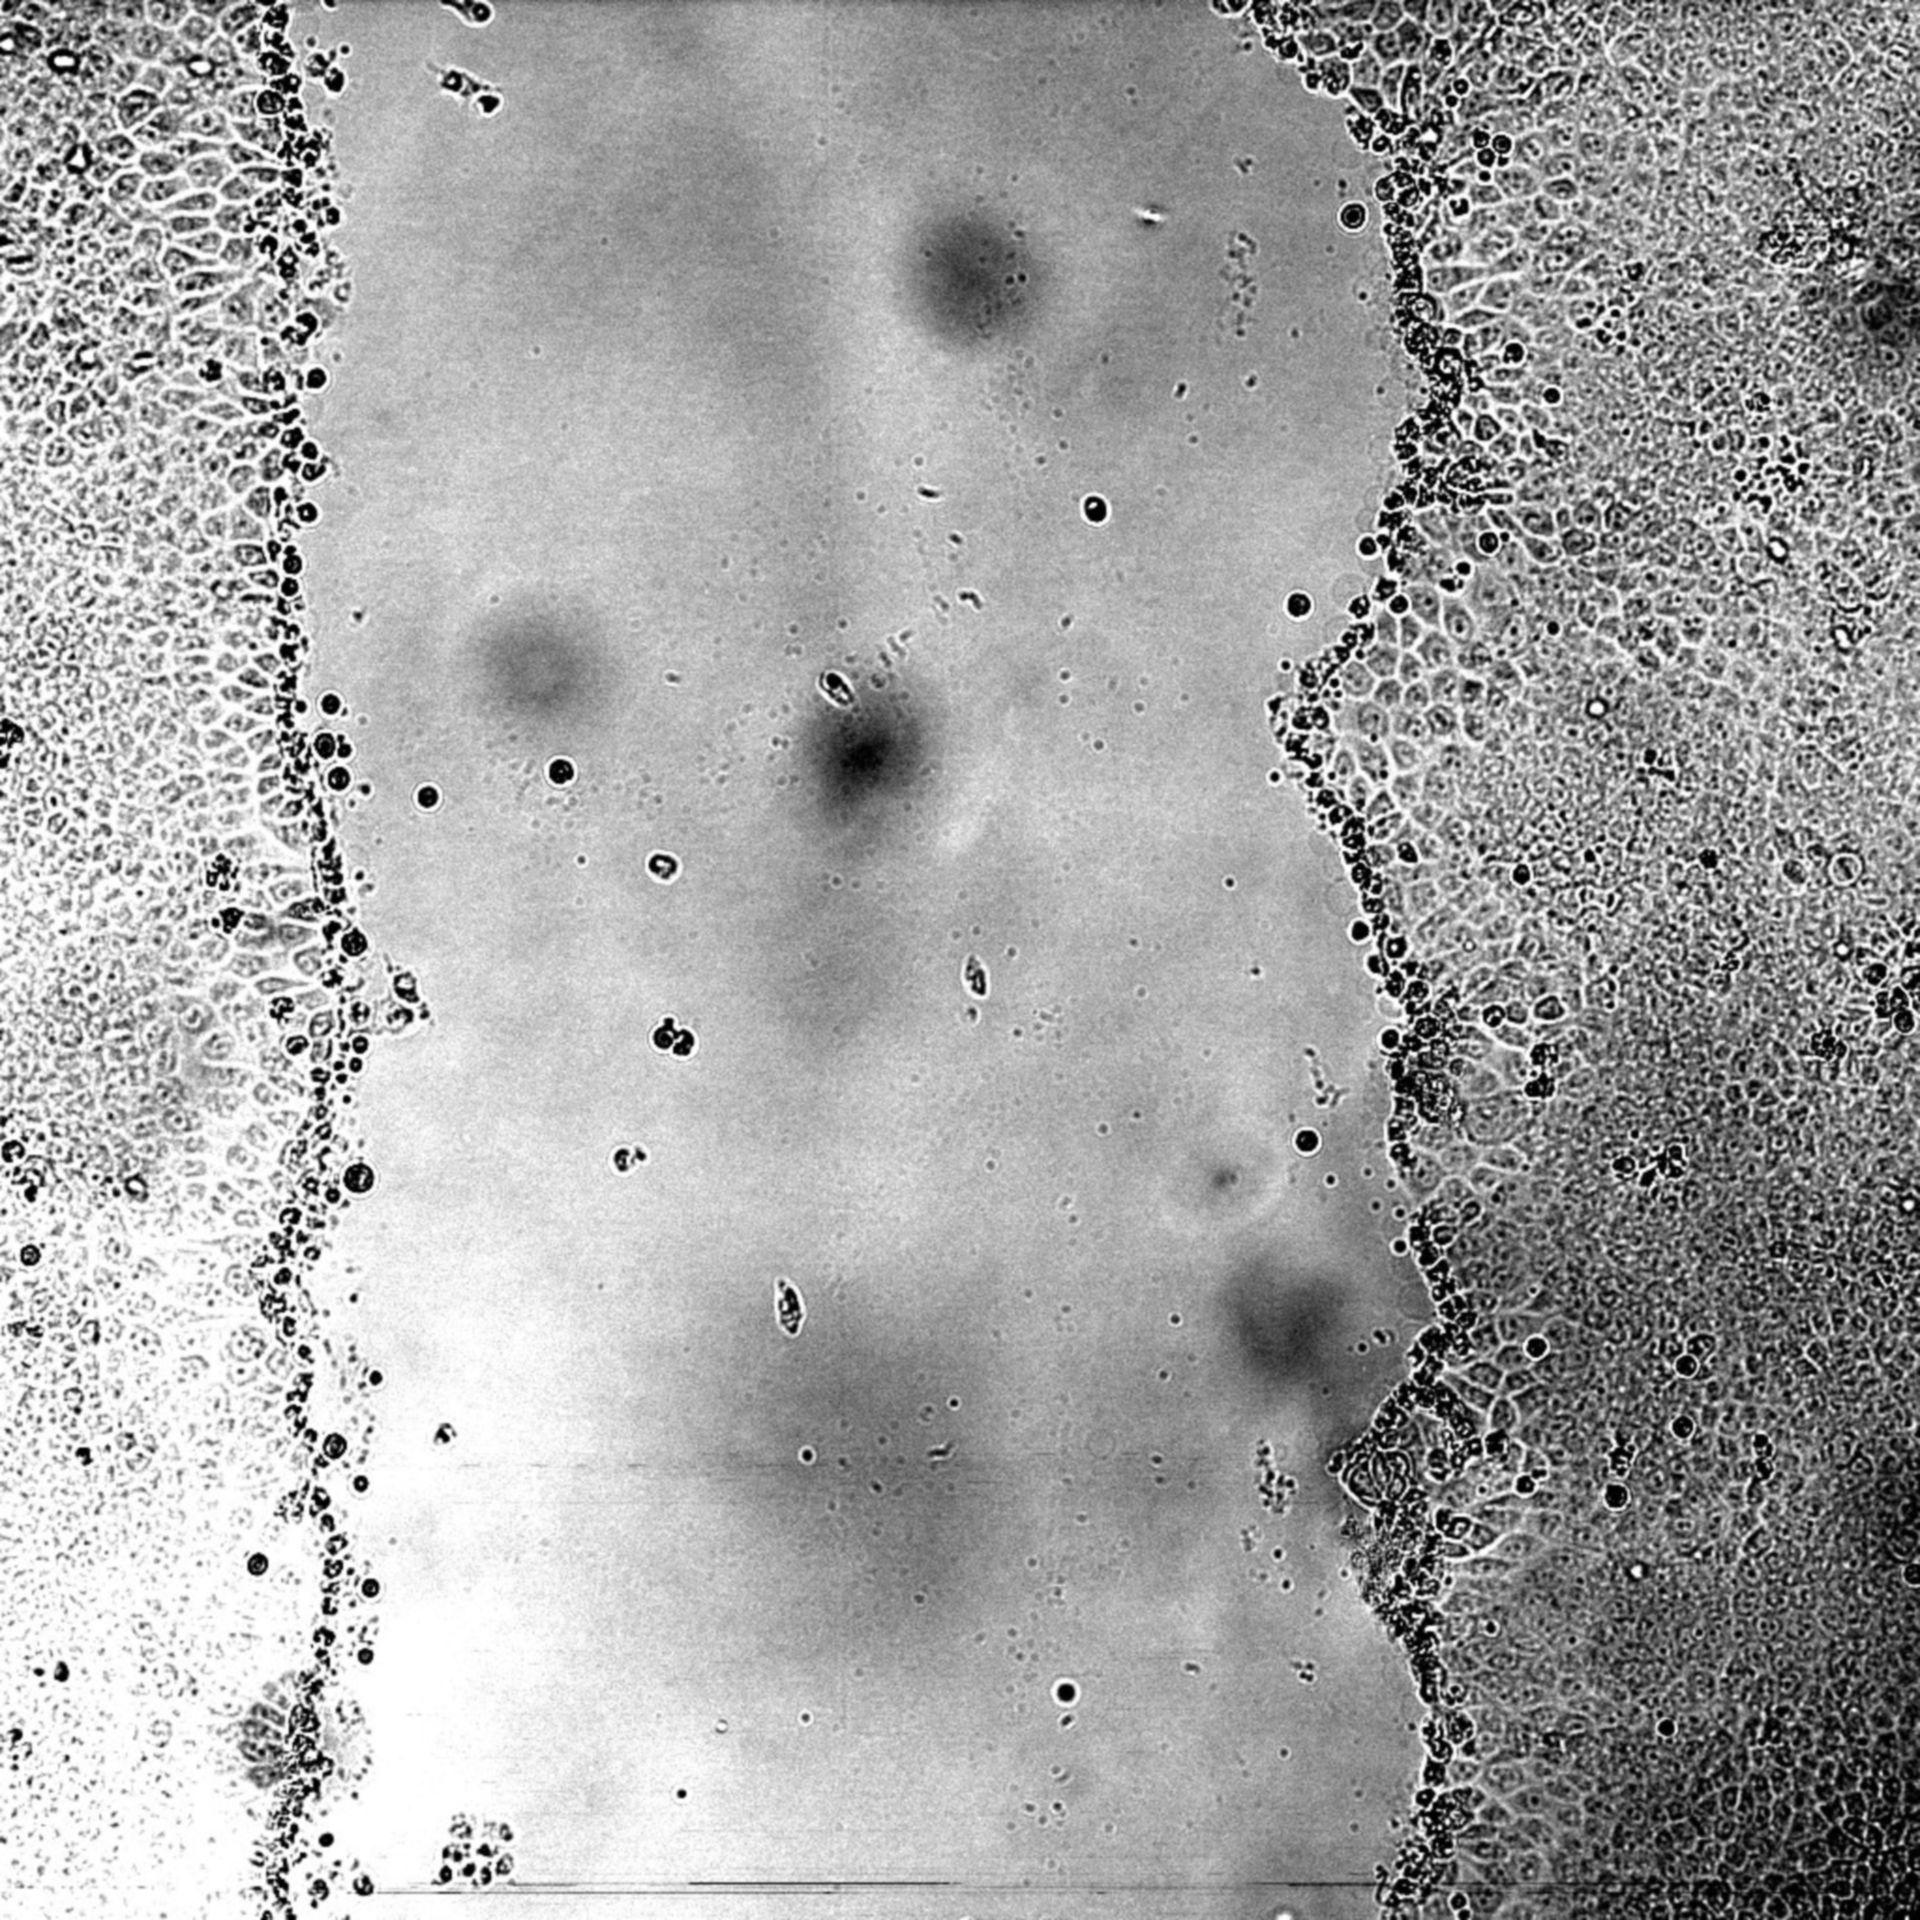 Canis lupus familiaris (cellule epiteliali del rene) - CIL: 44.505